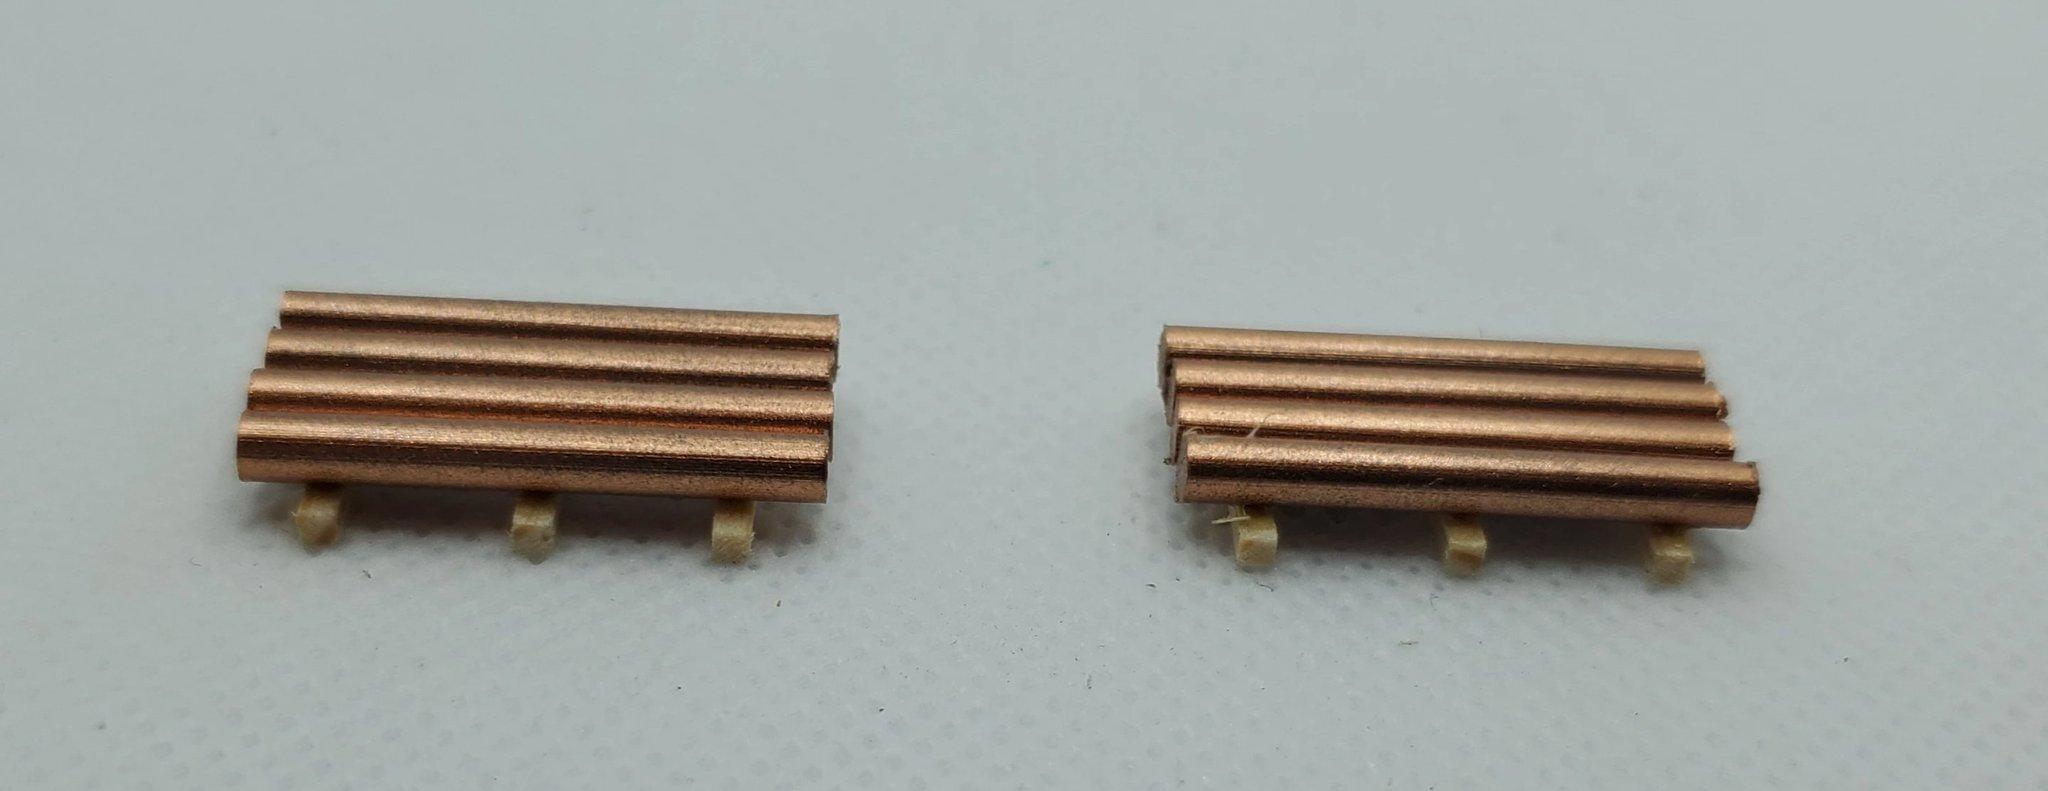 N Scale - CG Model Trains - 13538 - Railcar Loads - Painted/Unlettered - Copper Rod Loads